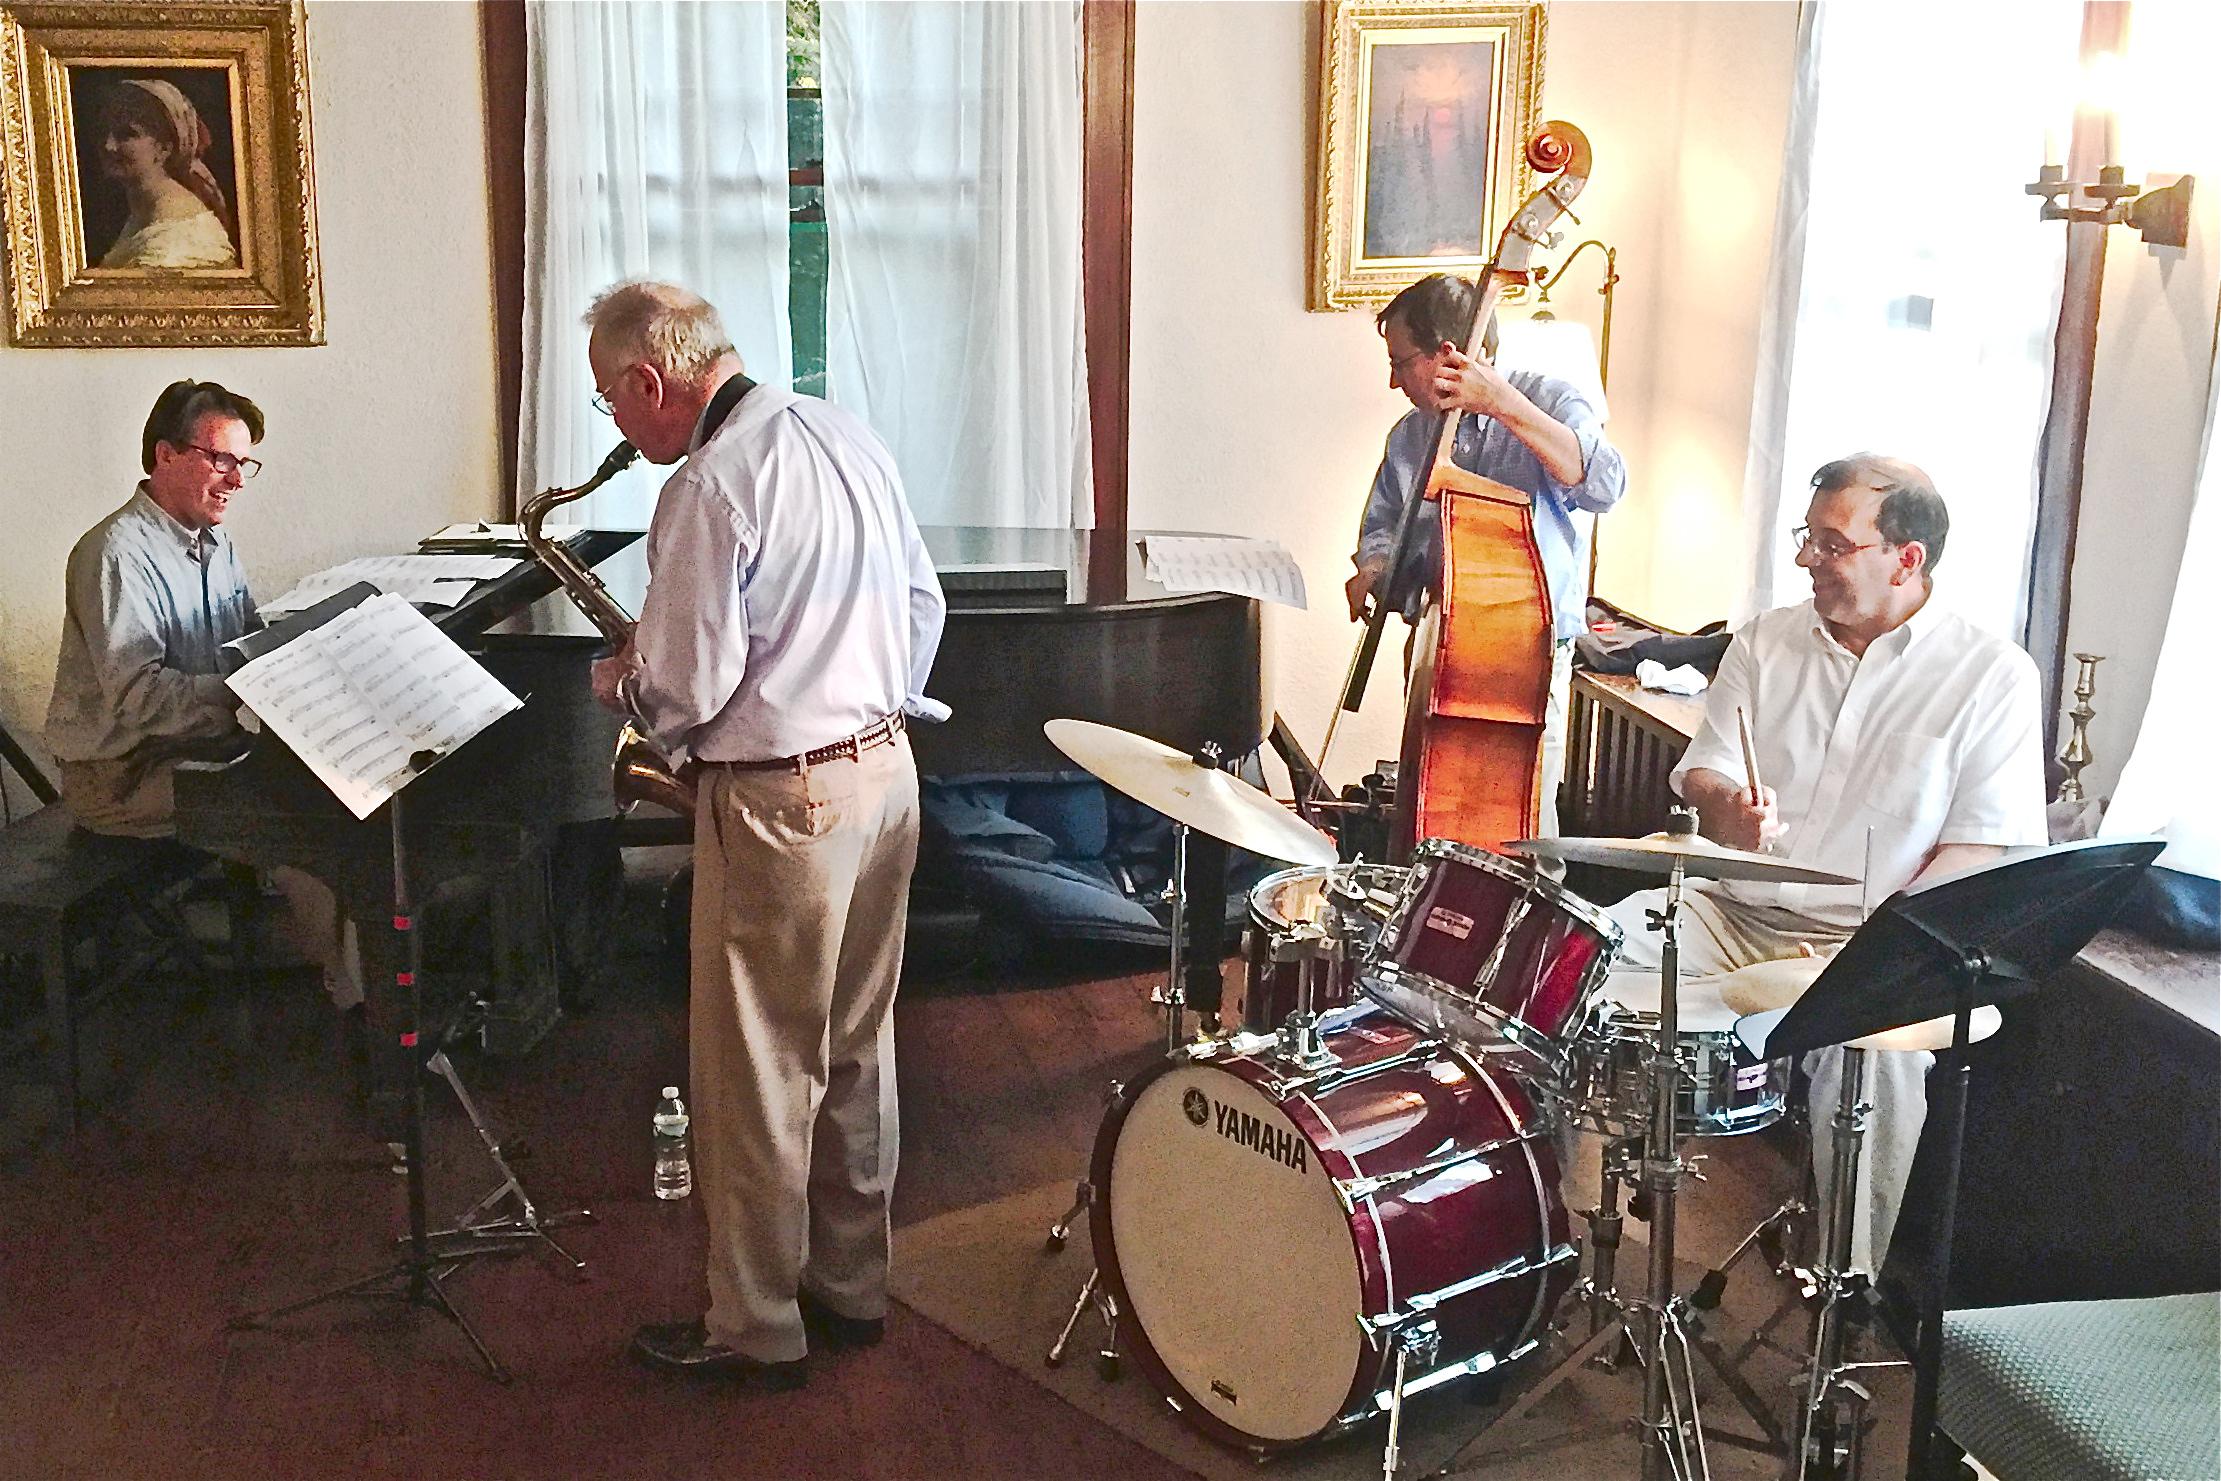 Grand Piano and Perfect Acoustics Provide Venue for Music